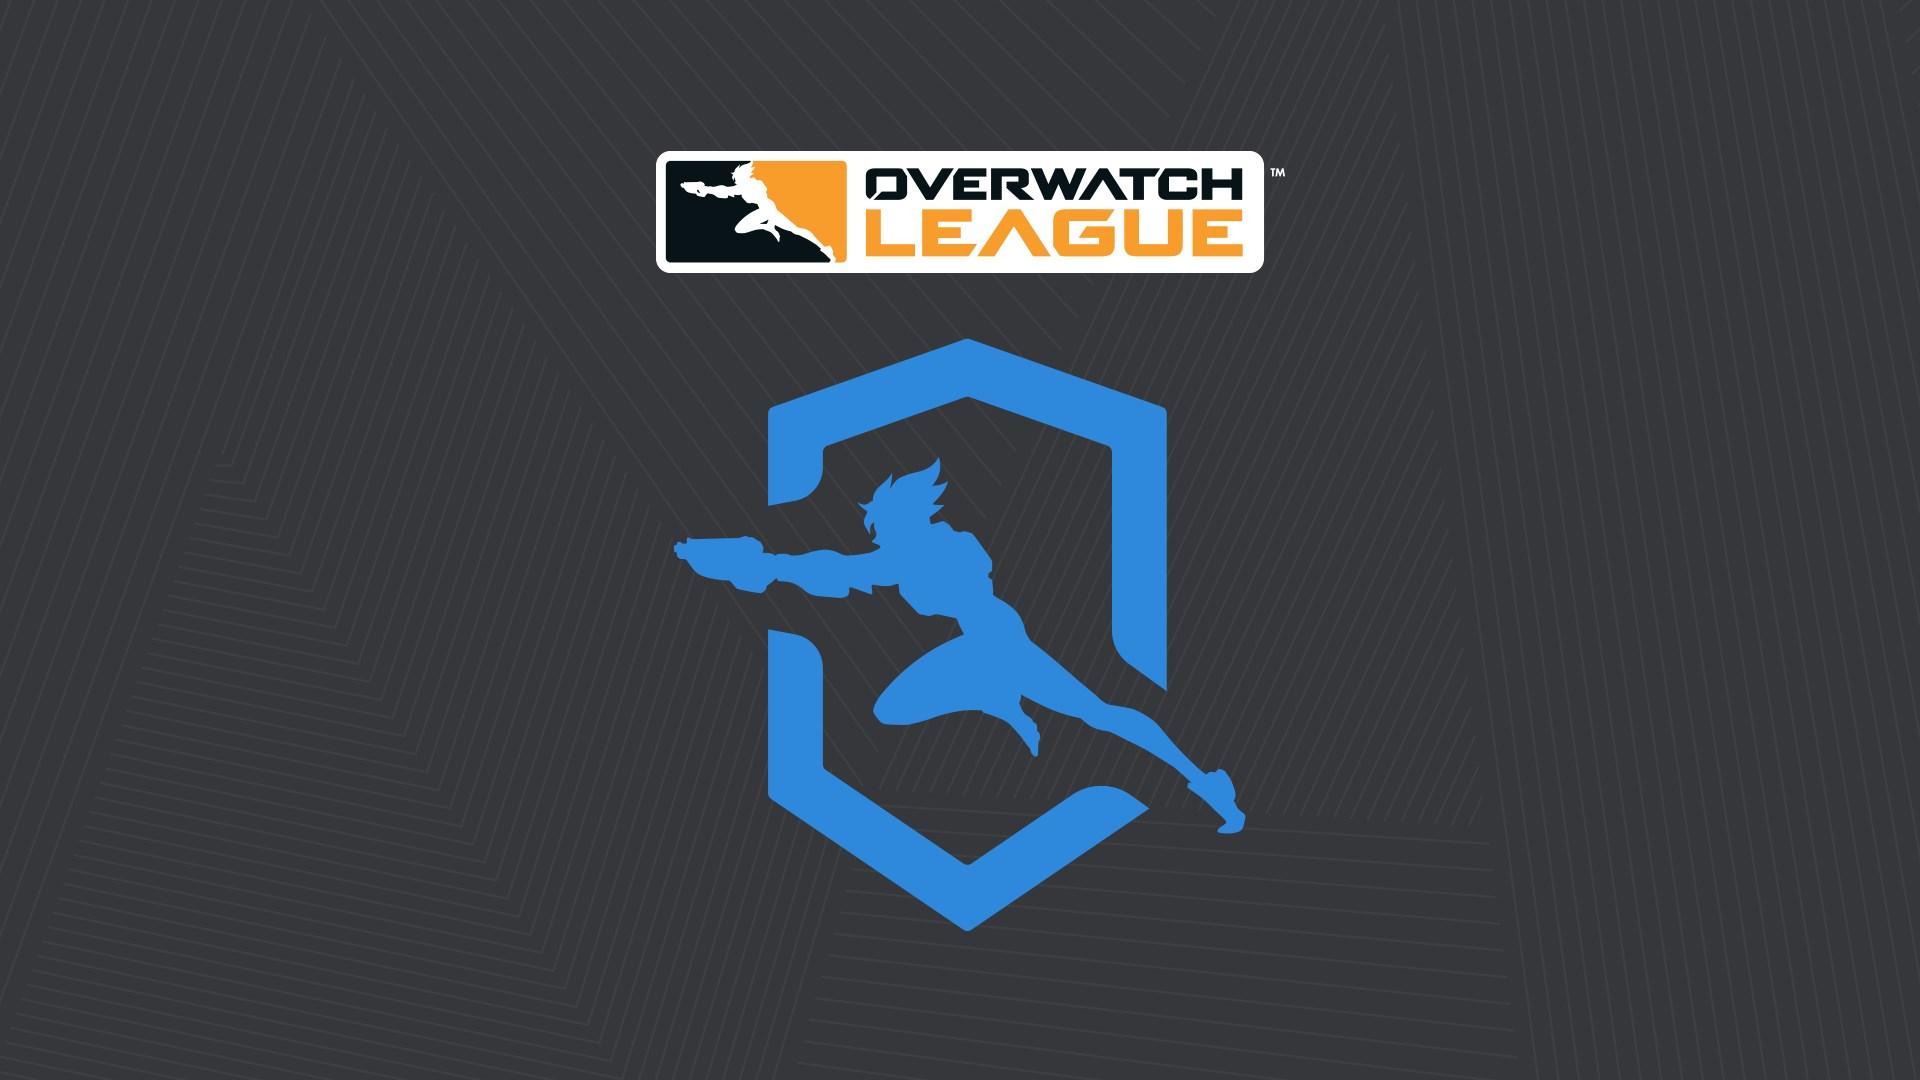 Overwatch League Marken